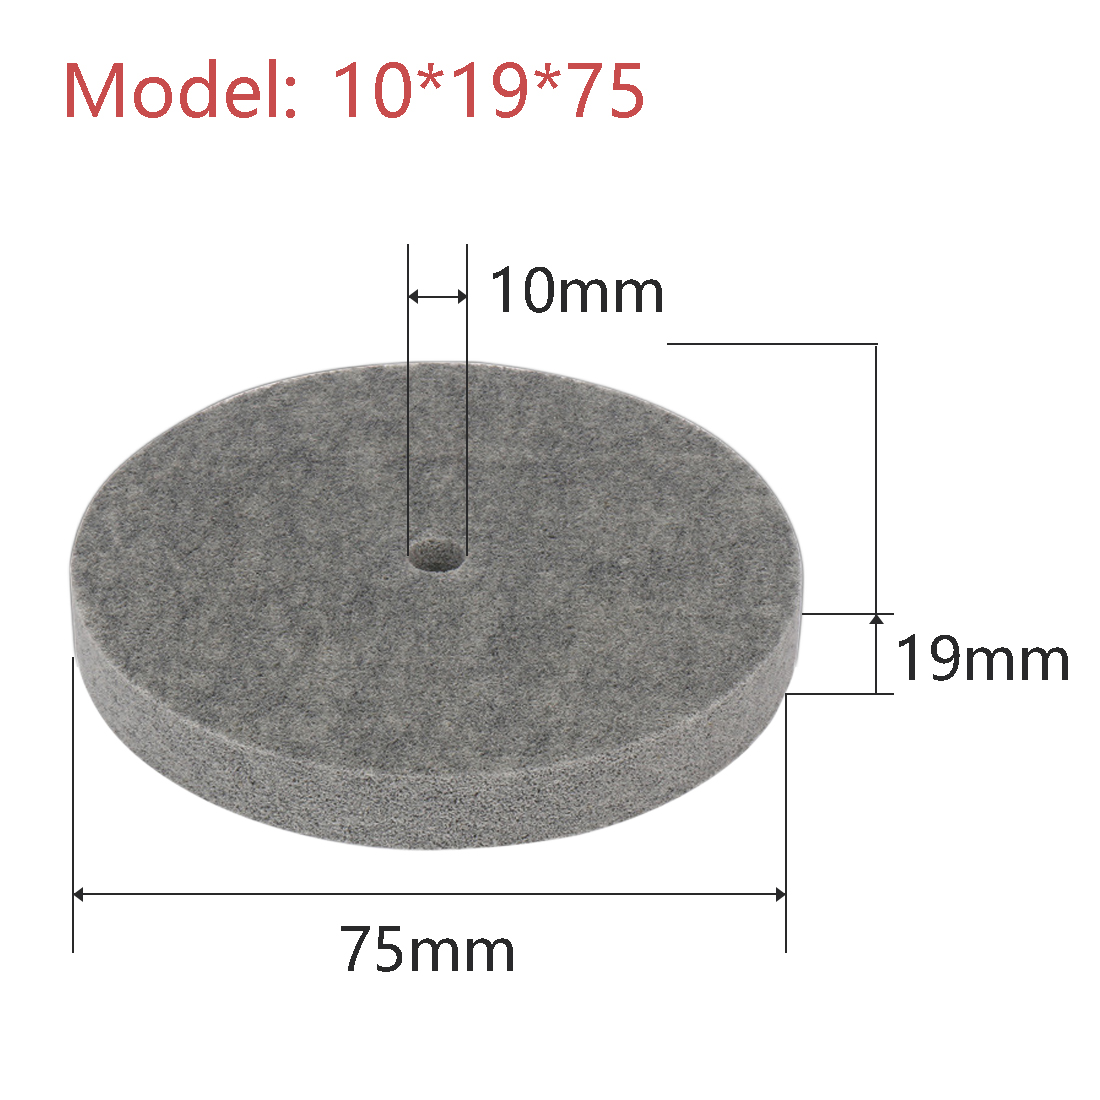 Tools Polishing Material Polishing Metal Fittings Grinding 75*19*10mm Nylon Fiber Wheels For Dremel Tool Accessories